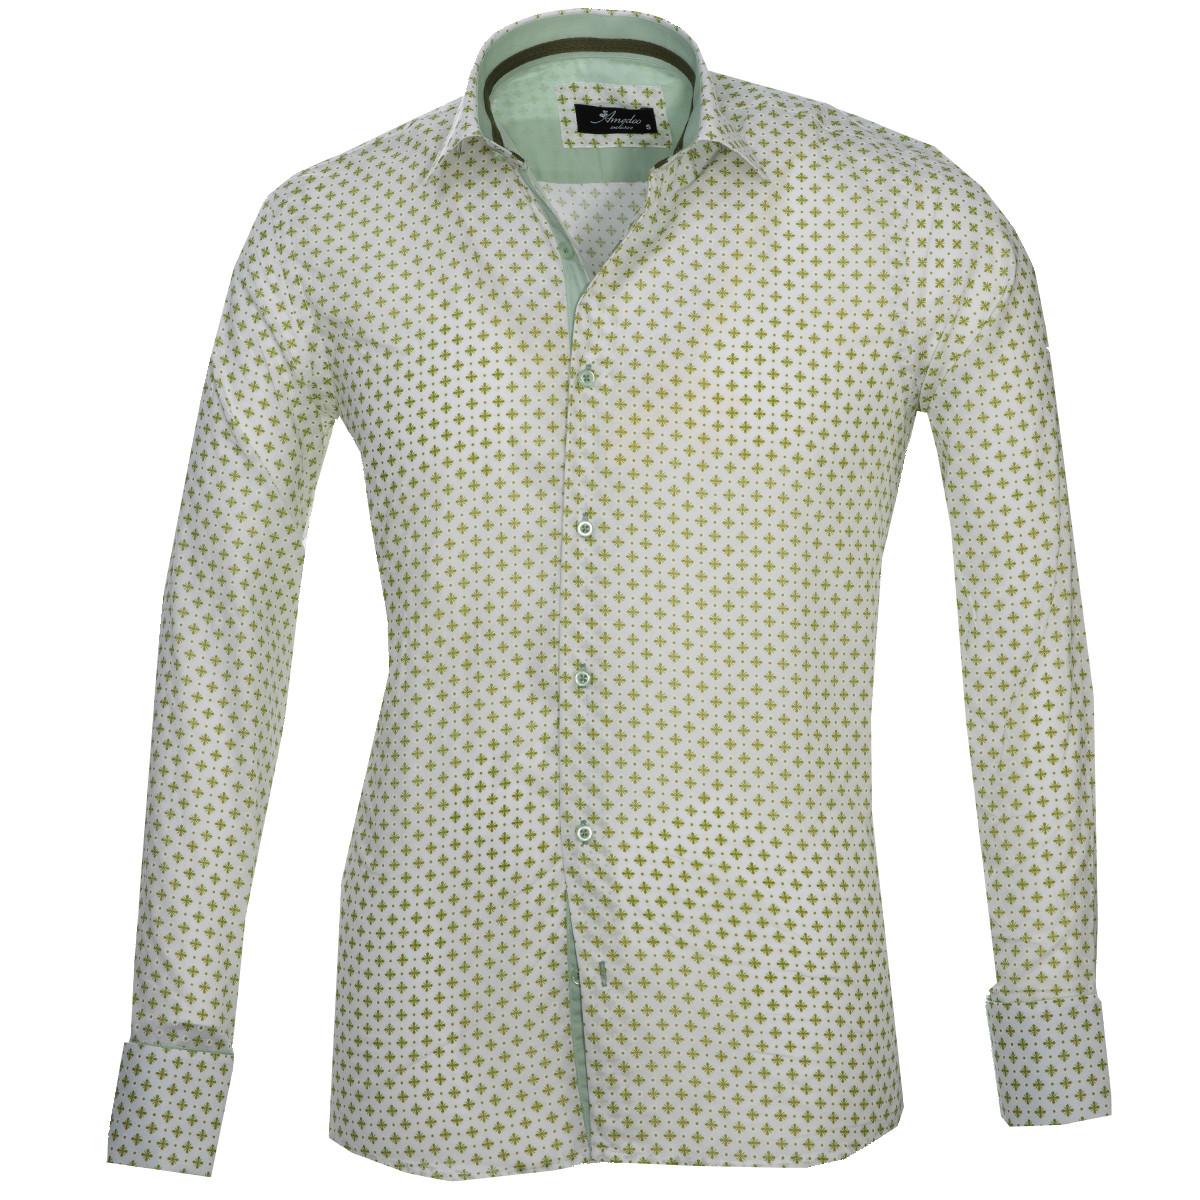 European Made & Designed Reversible Cuff Premium French Cuff Dress Shirt - light green